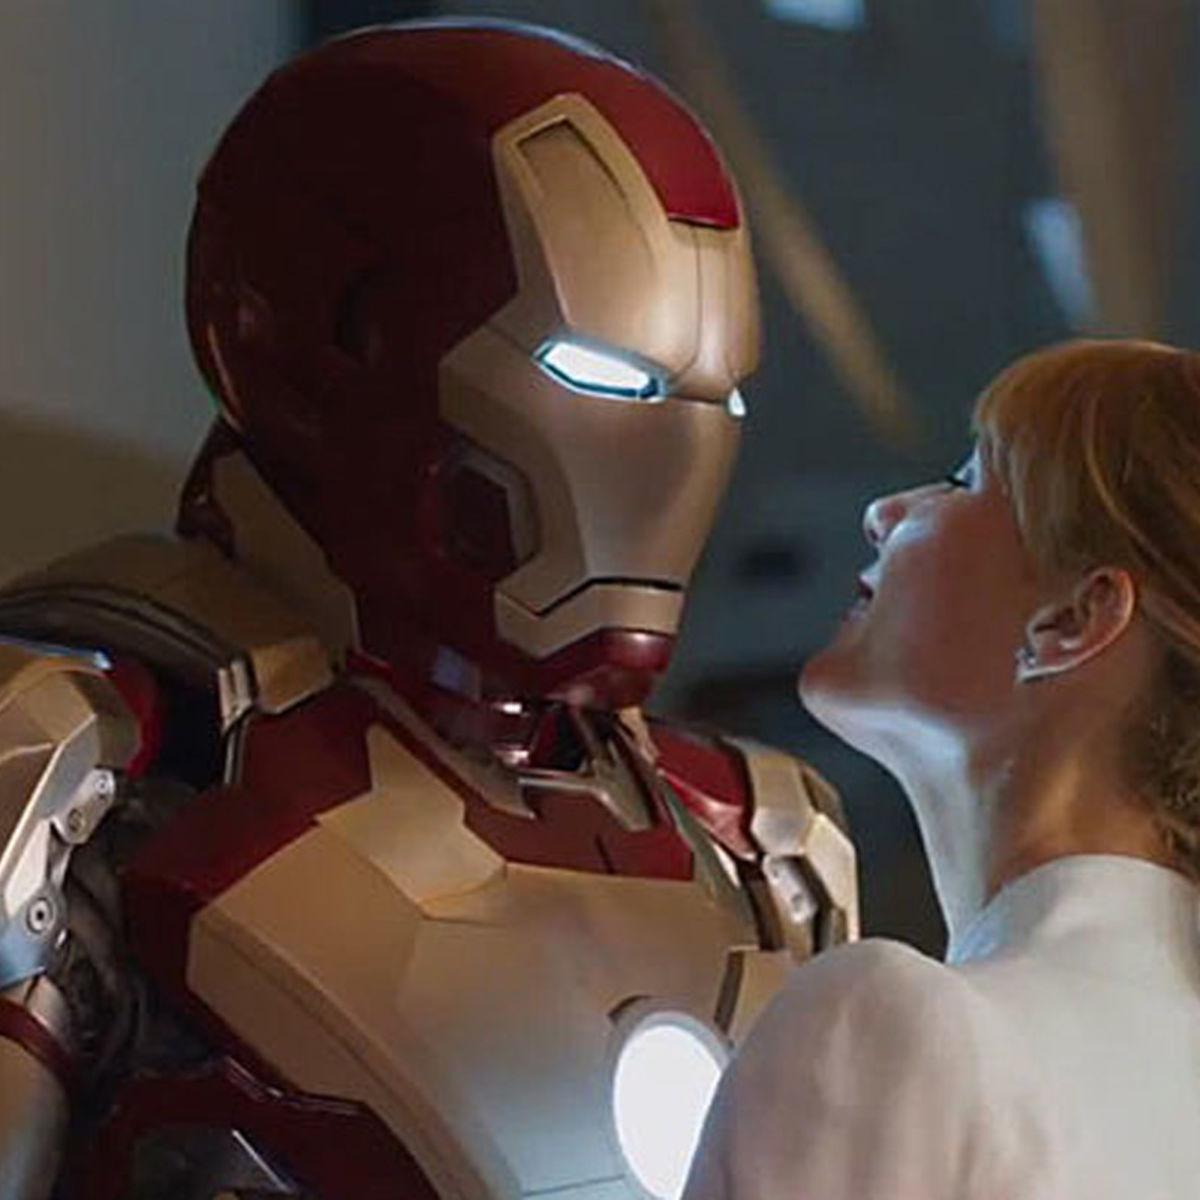 iron-man-3-trailer-tease-2.jpg